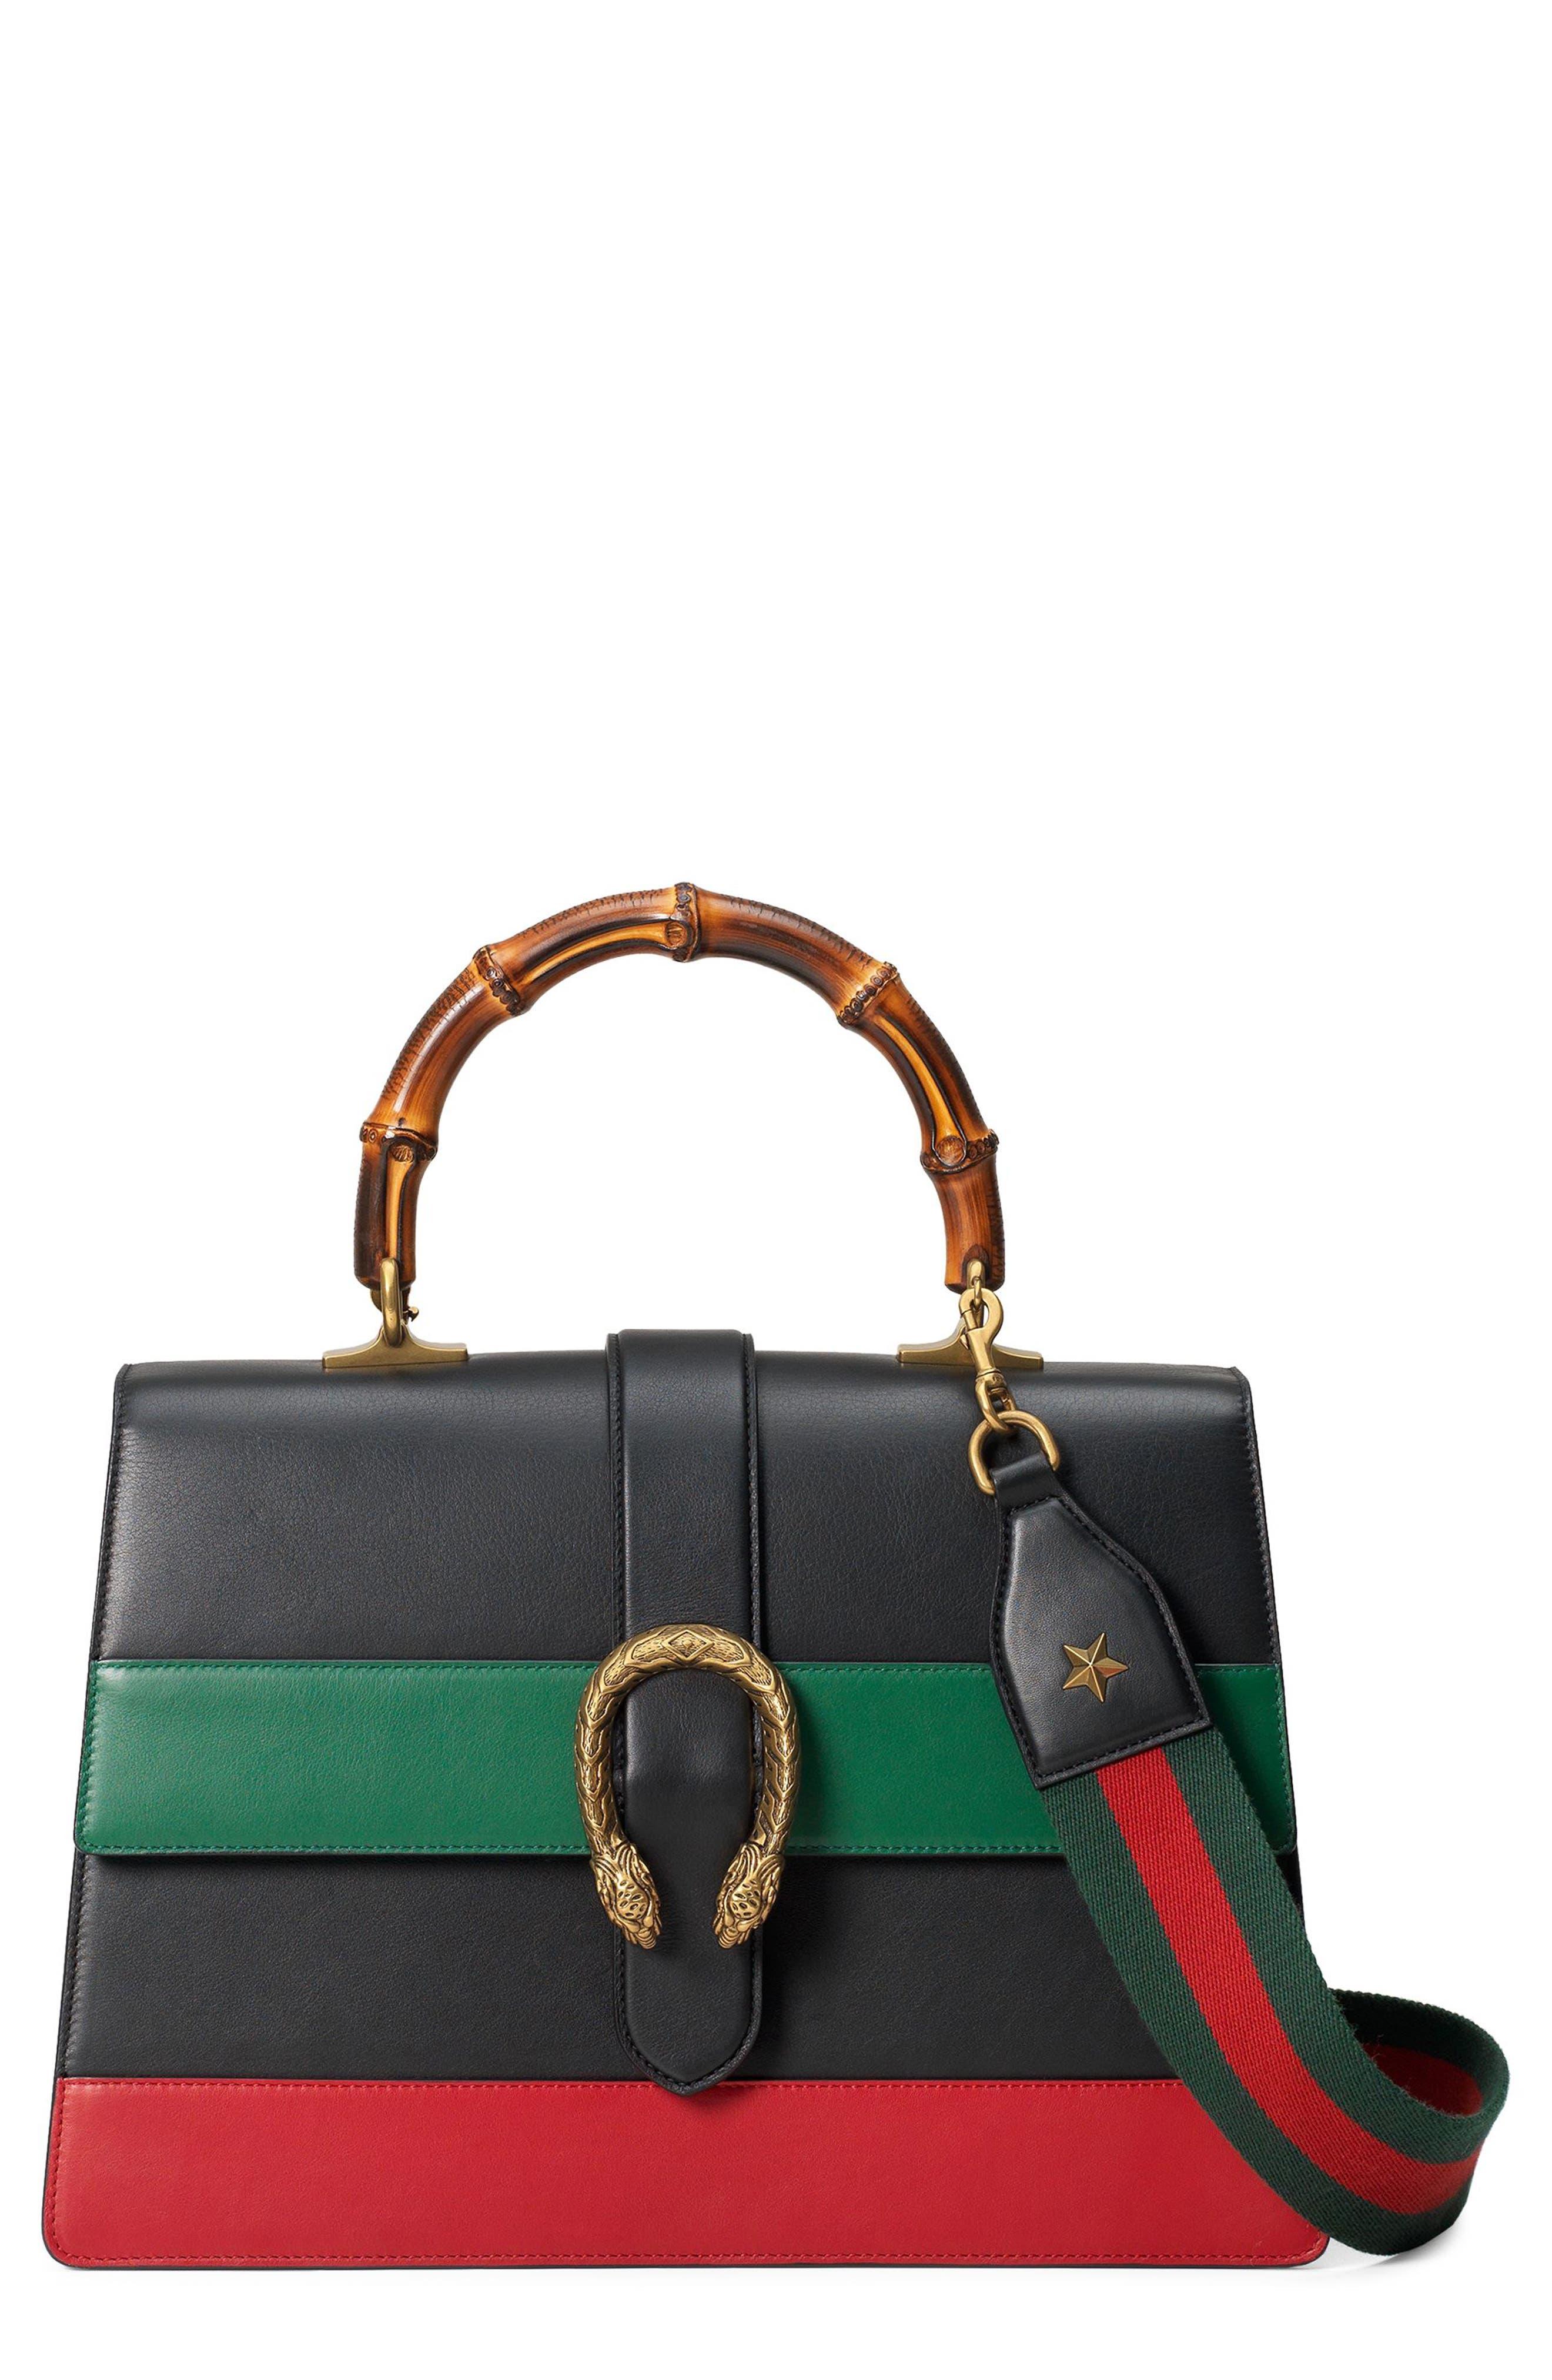 Alternate Image 1 Selected - Gucci Large Dionysus Top Handle Leather Shoulder Bag